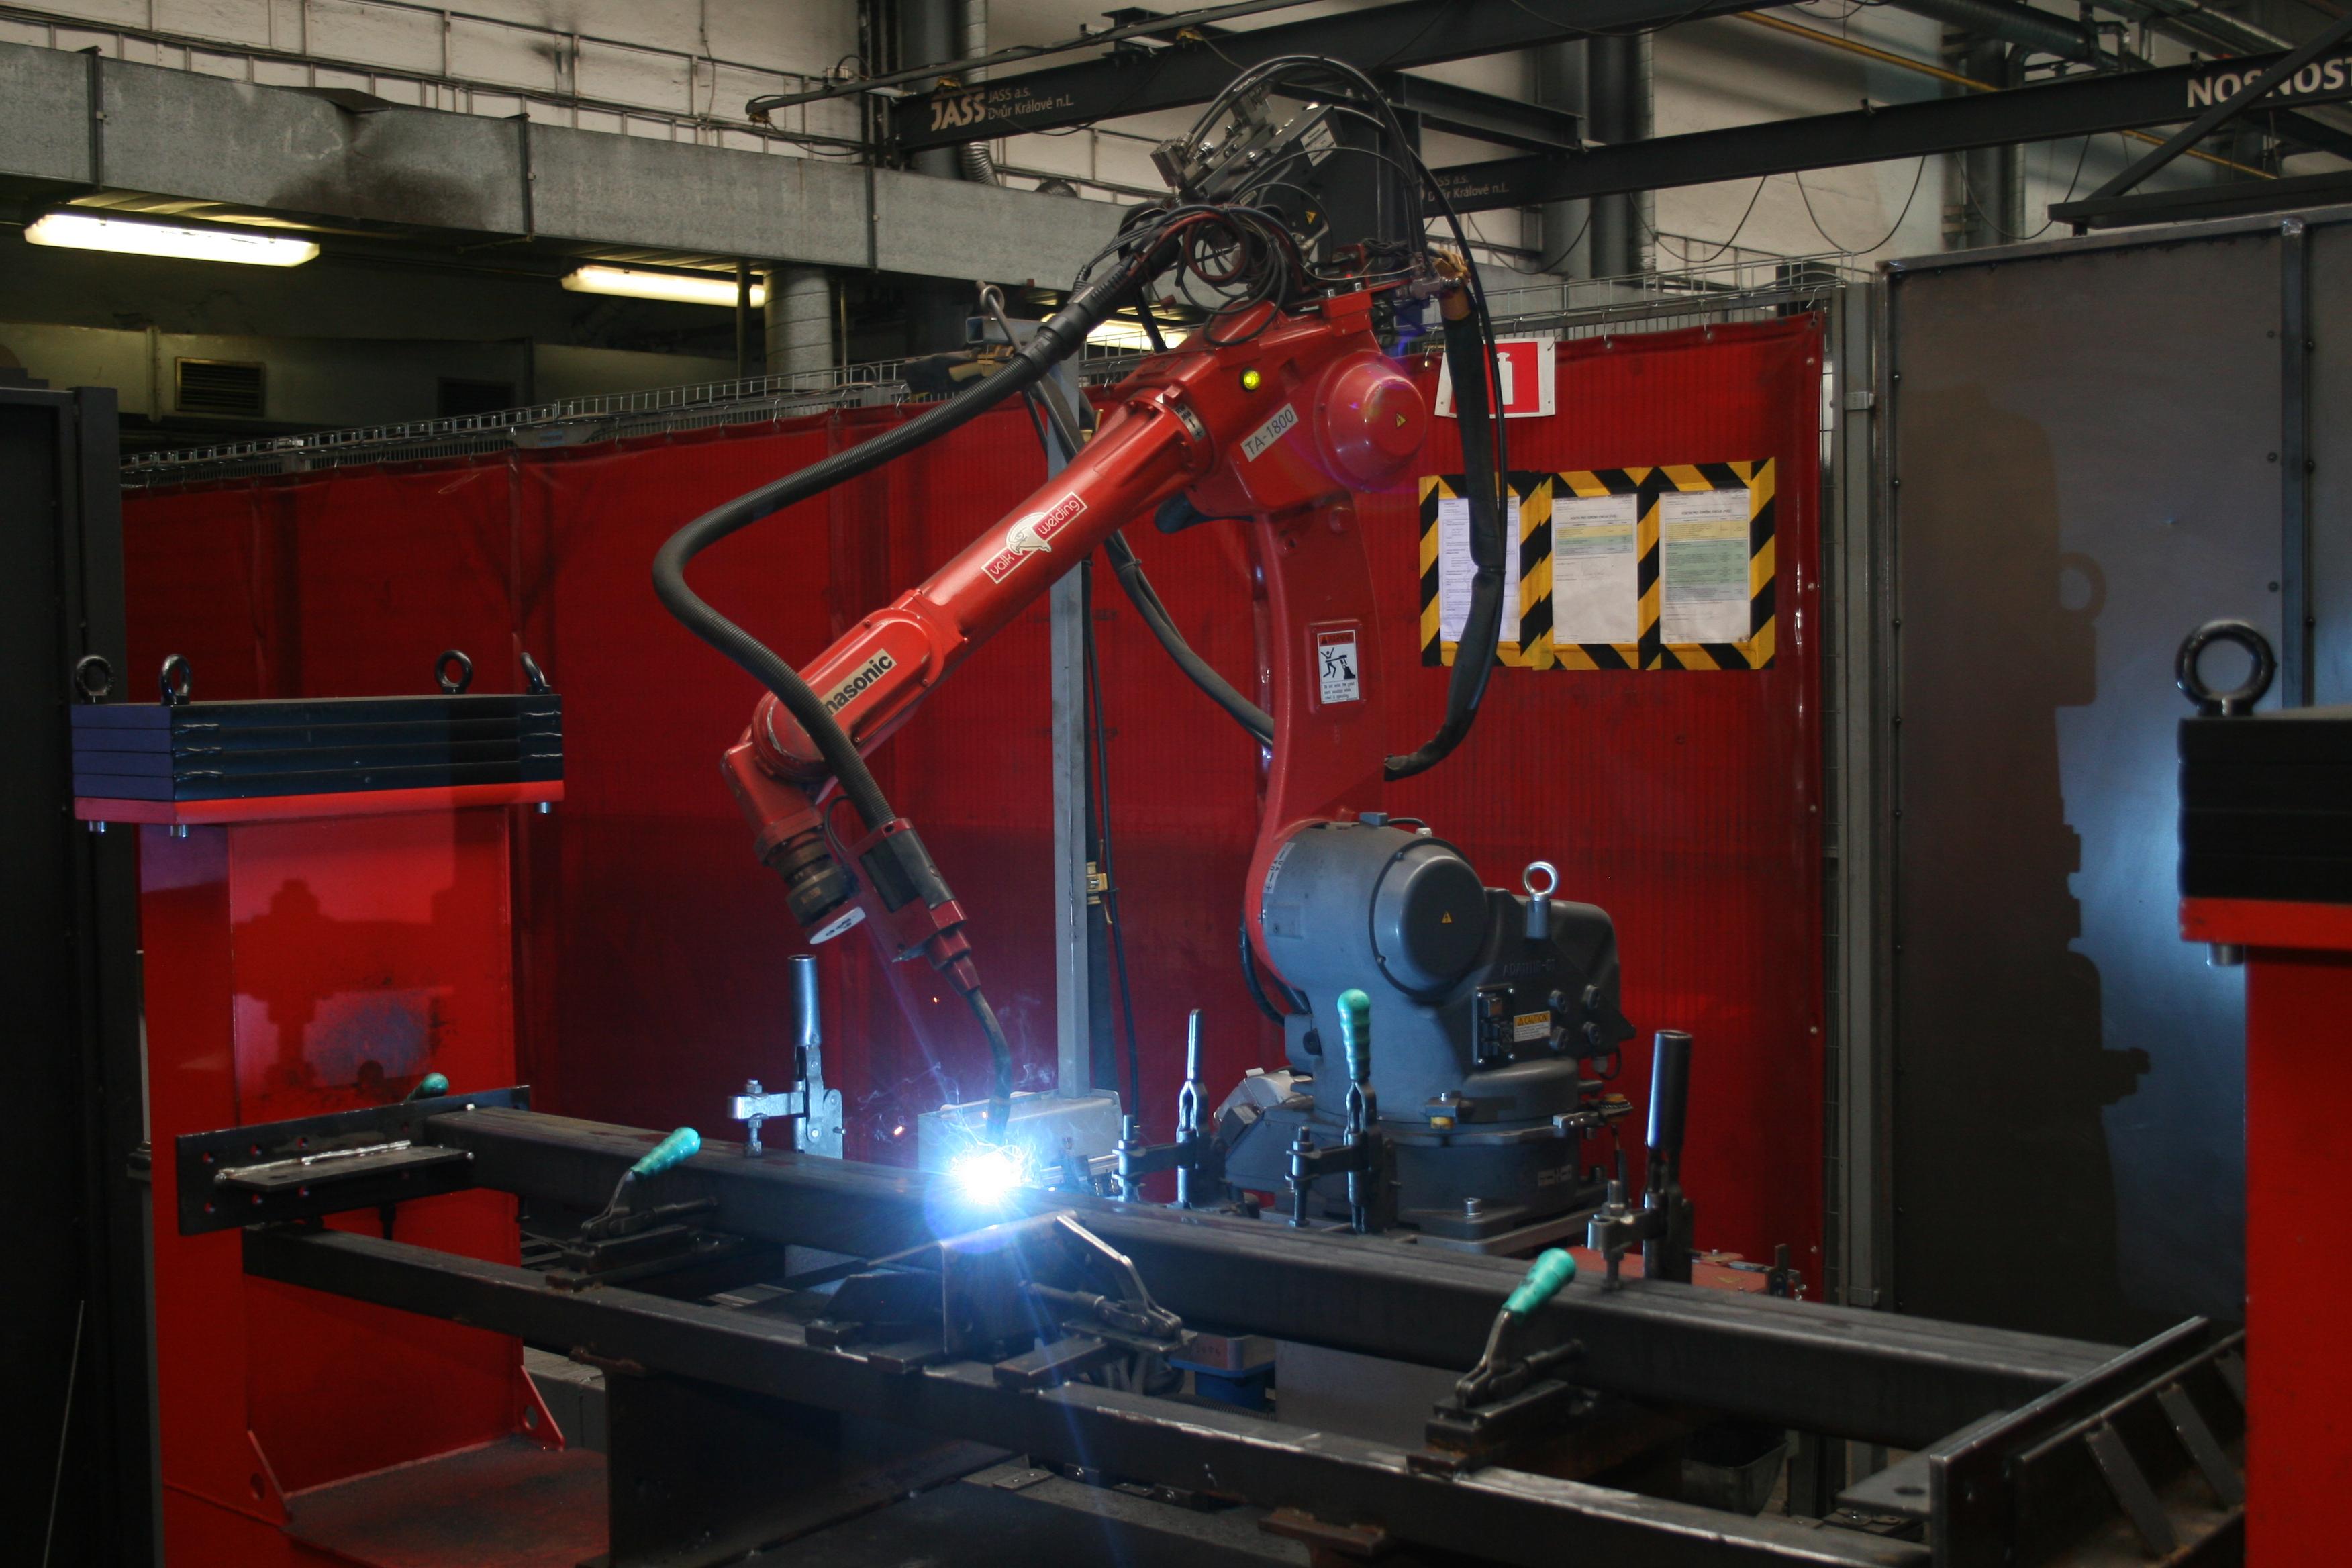 roboticke-svarovani-hlavni-fotka